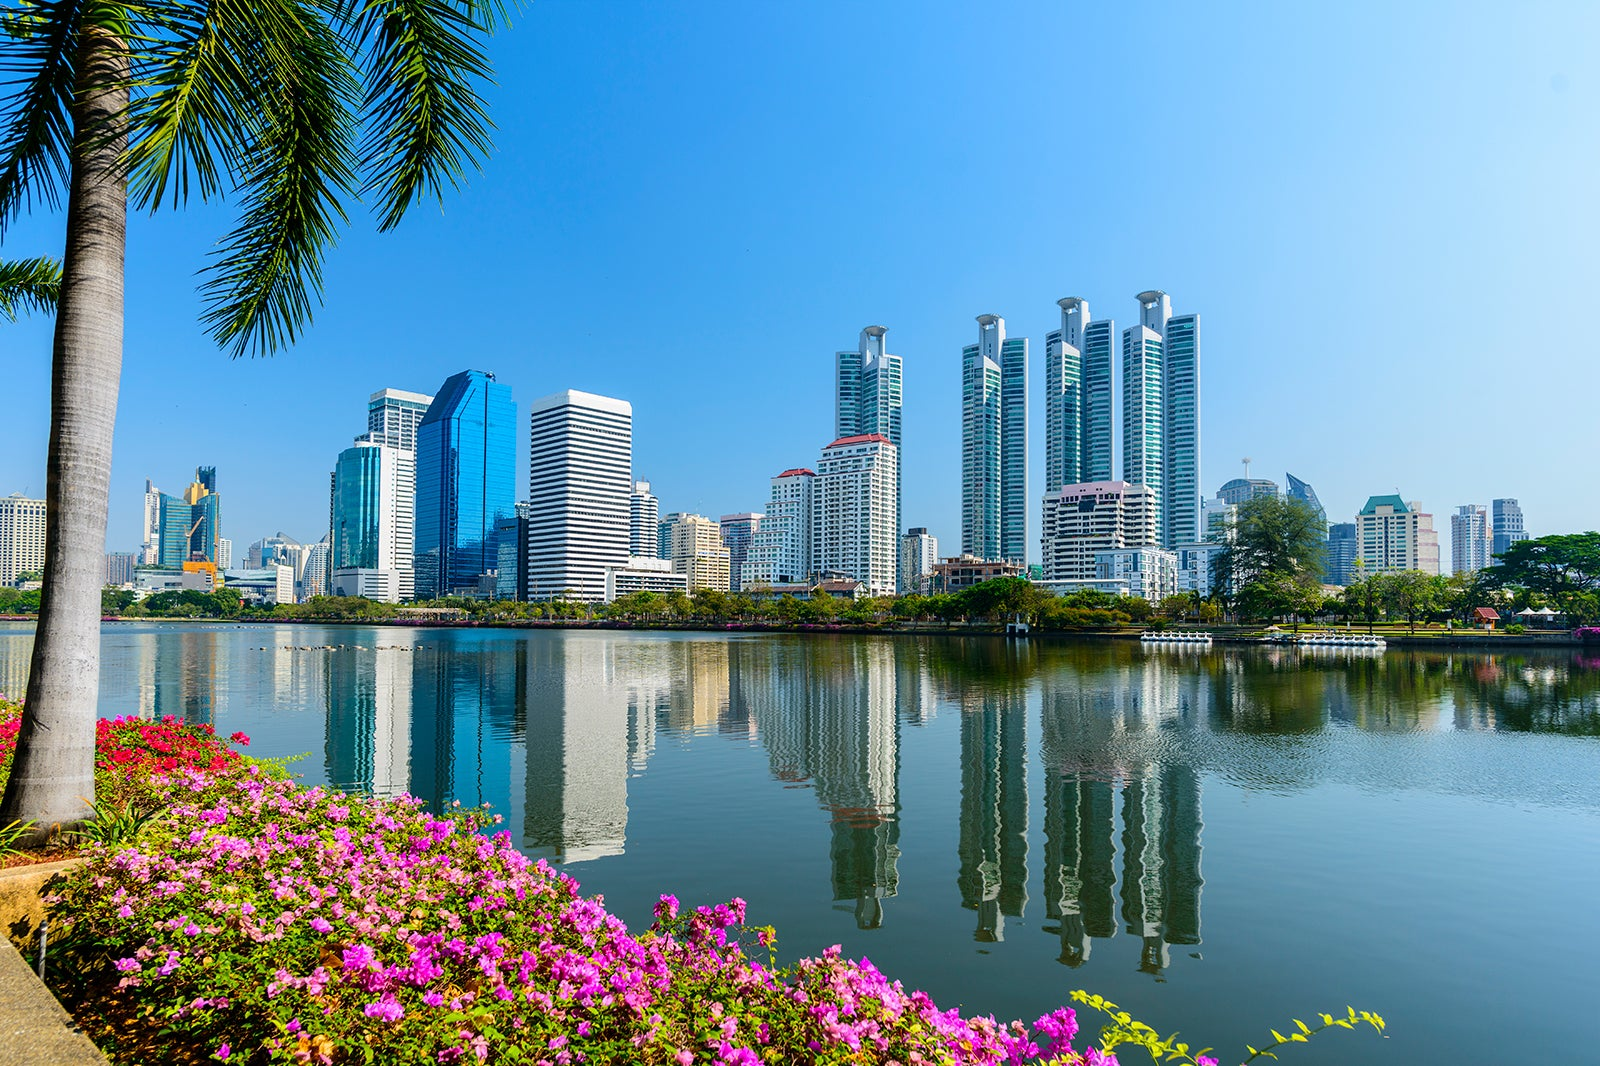 11 Great Parks in Bangkok - Bangkok's Most Popular Parks – Go Guides